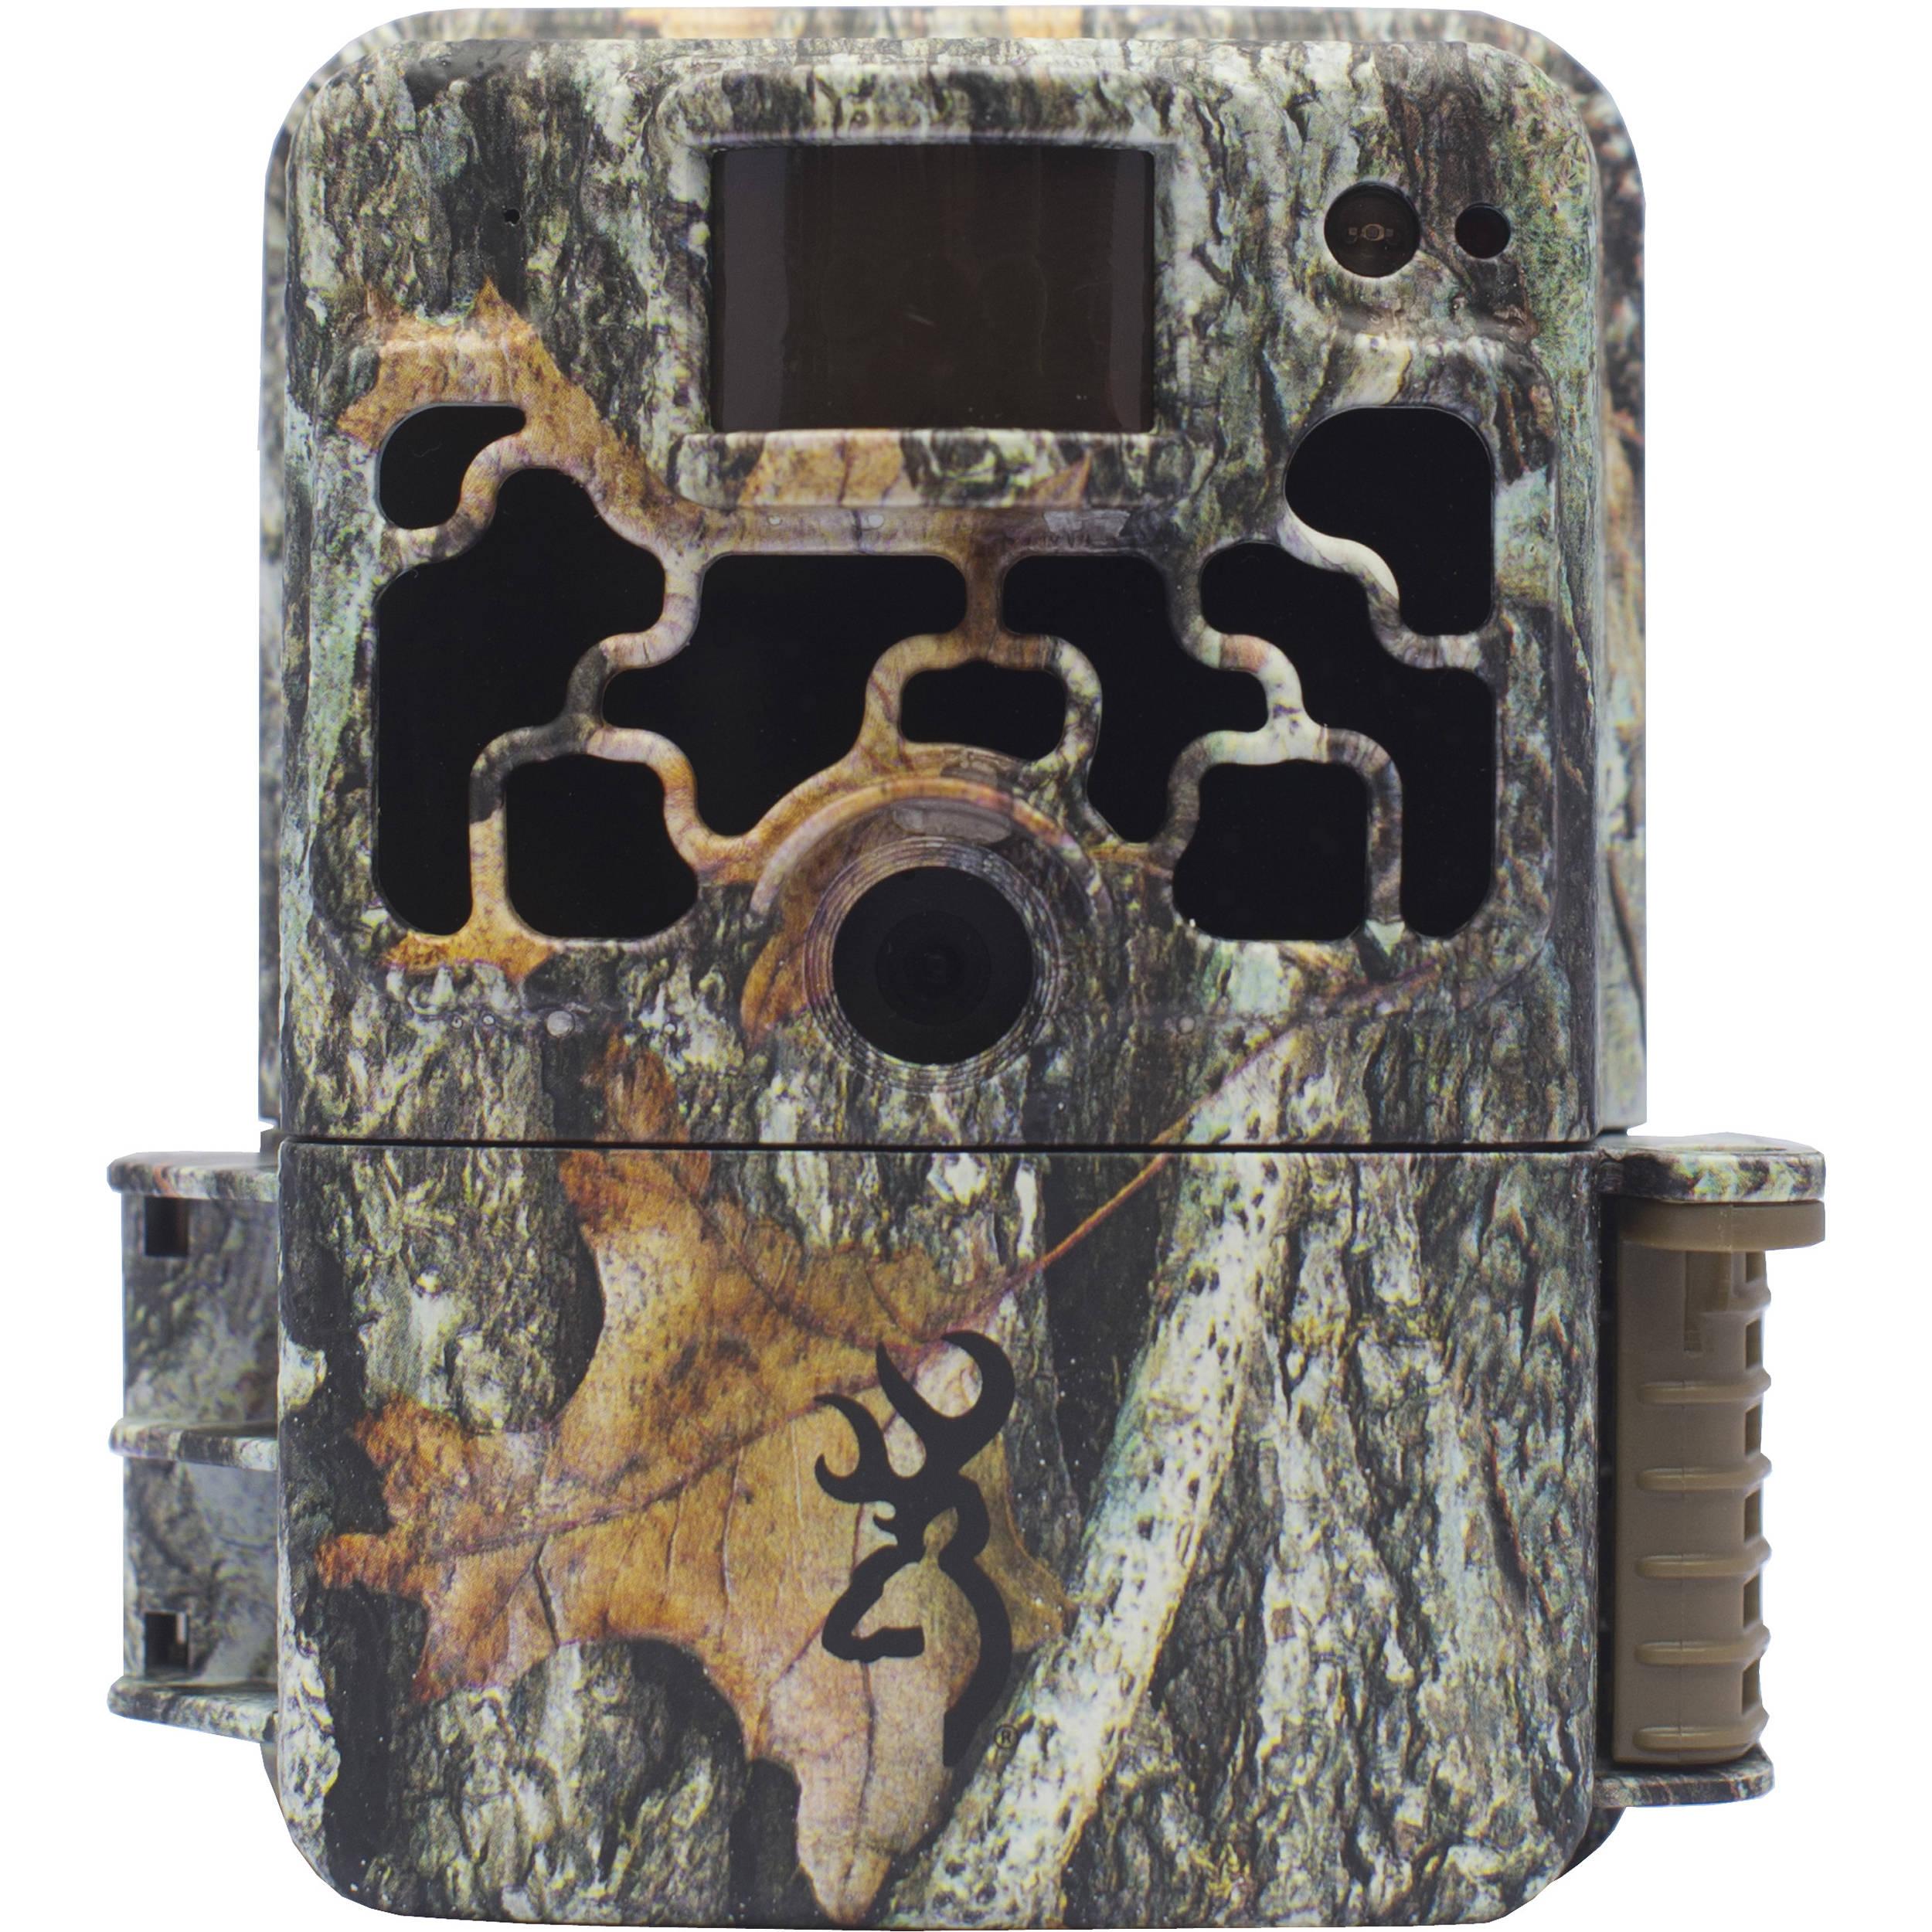 Browning Dark Ops 940 HD Trail Camera BTC 6HD 940 B&H Photo